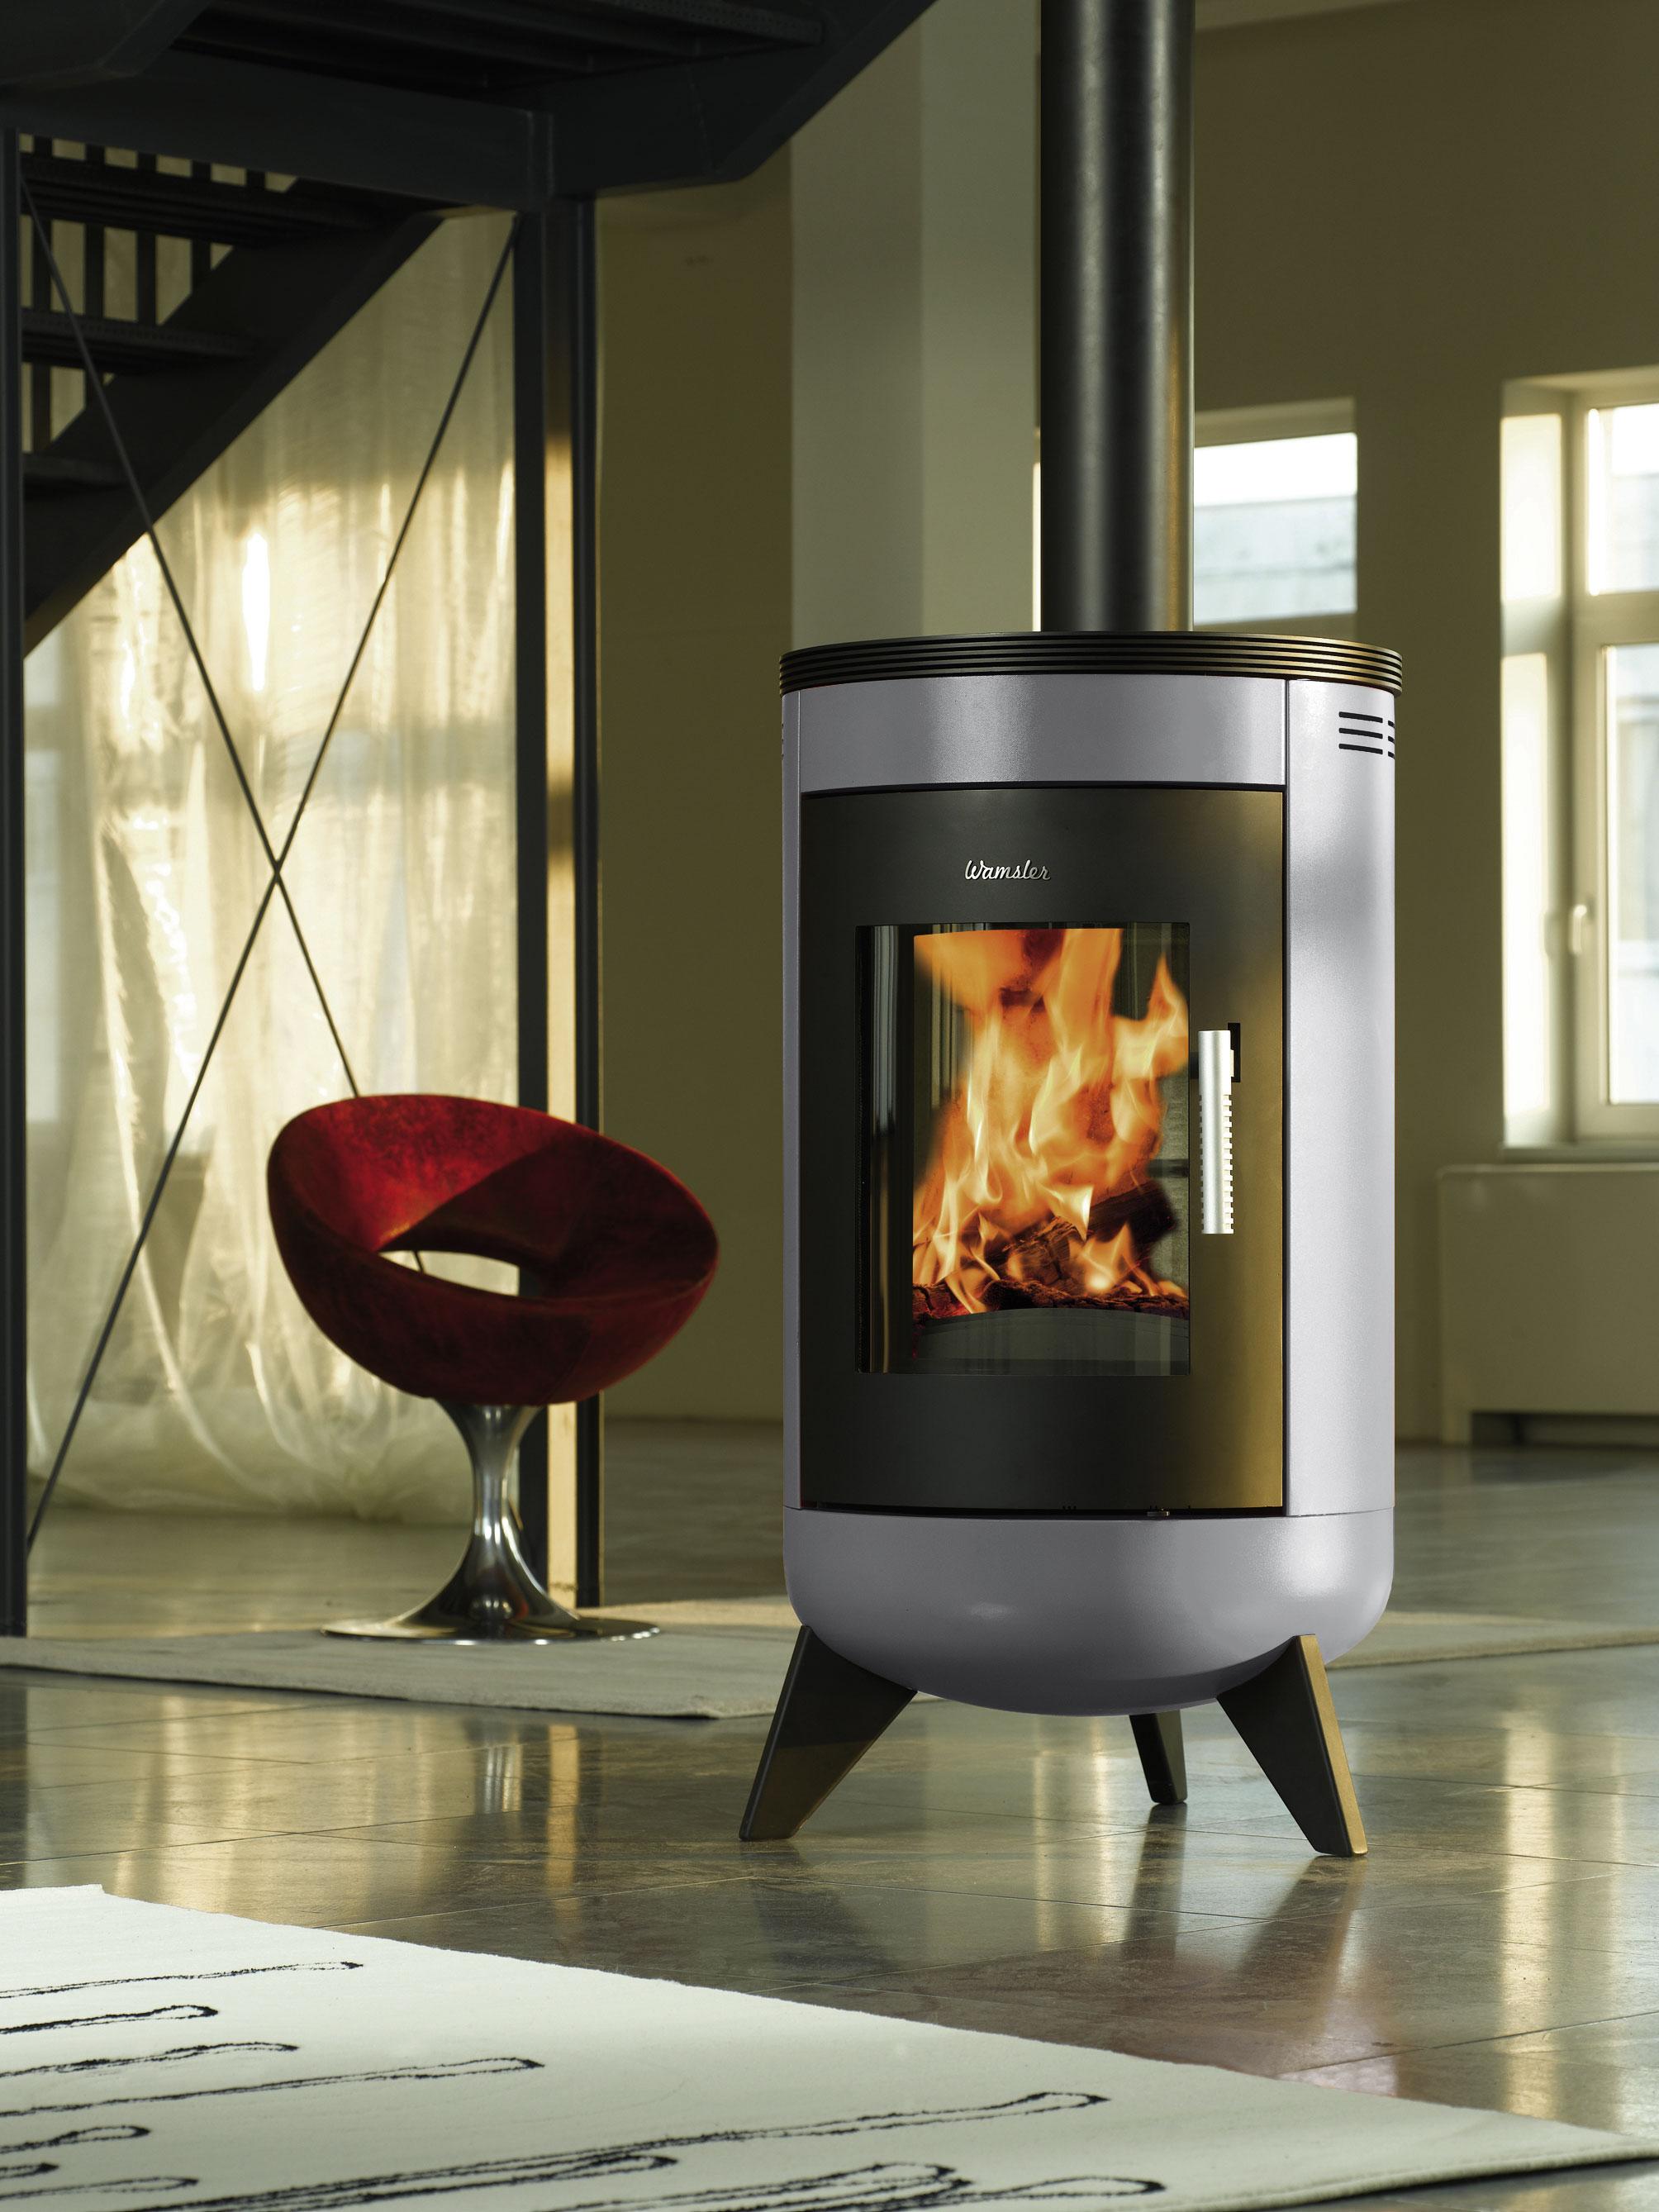 kamin metropolitan kaminofen wamsler silver online kaufen. Black Bedroom Furniture Sets. Home Design Ideas